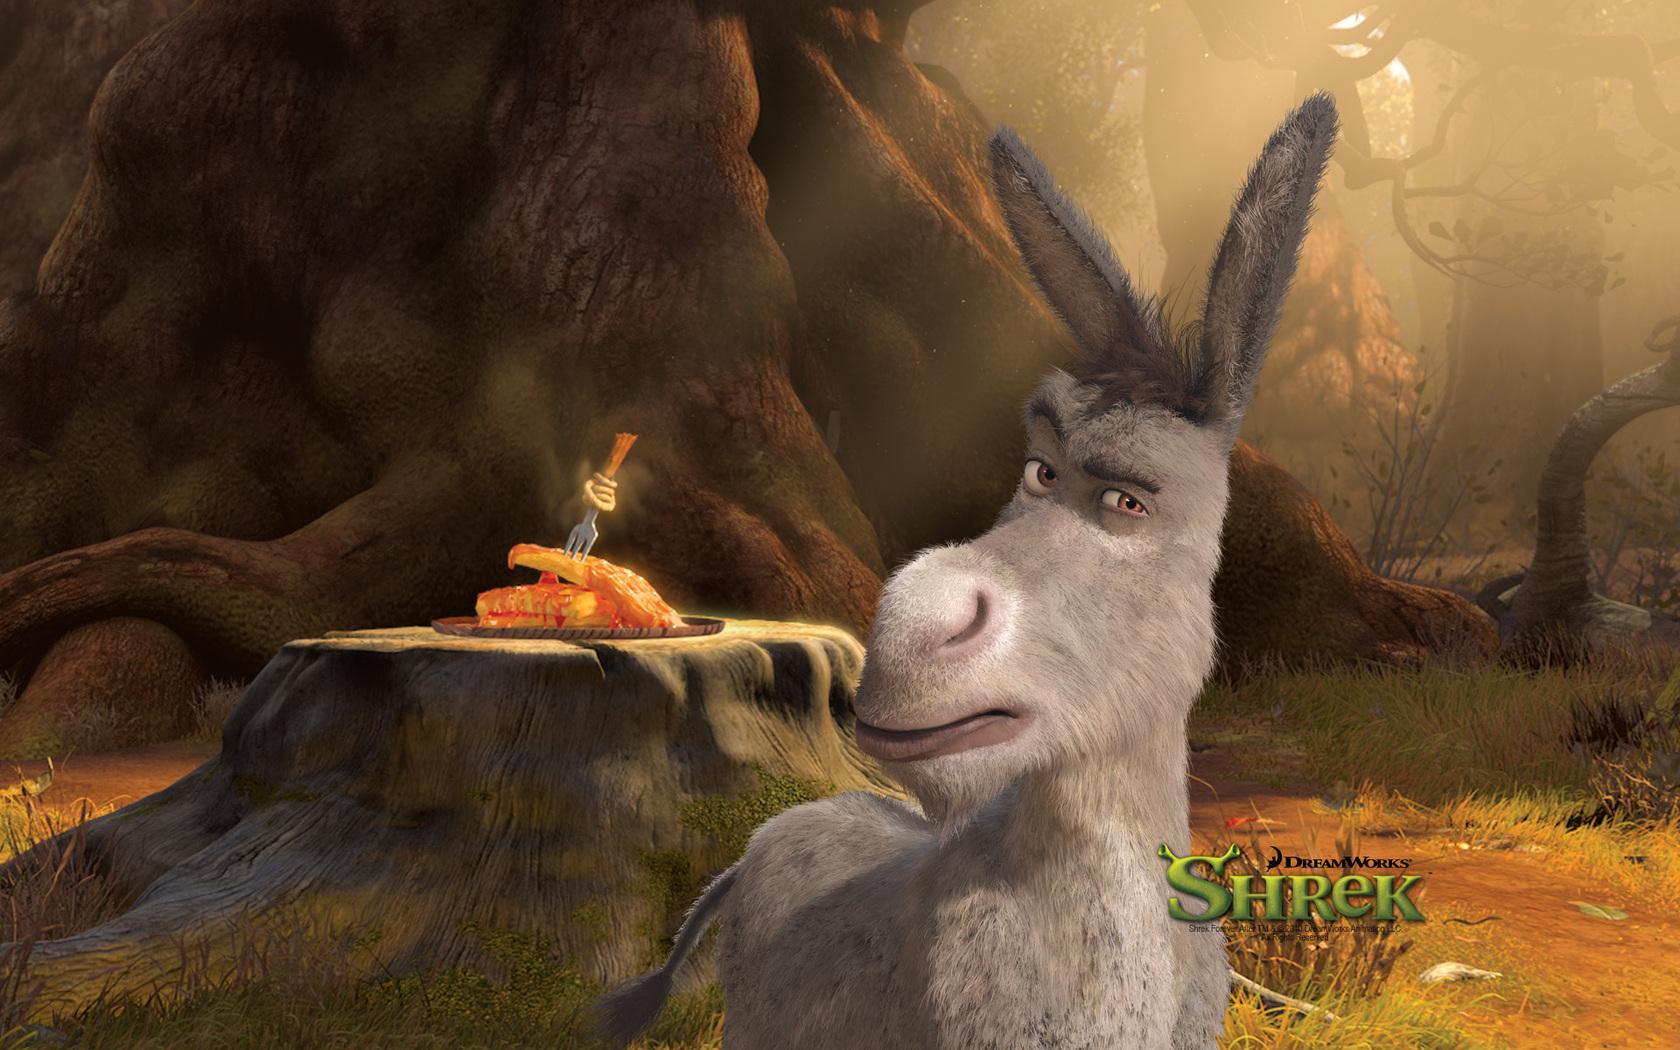 Wallpaper Shrek Donkey Cartoons